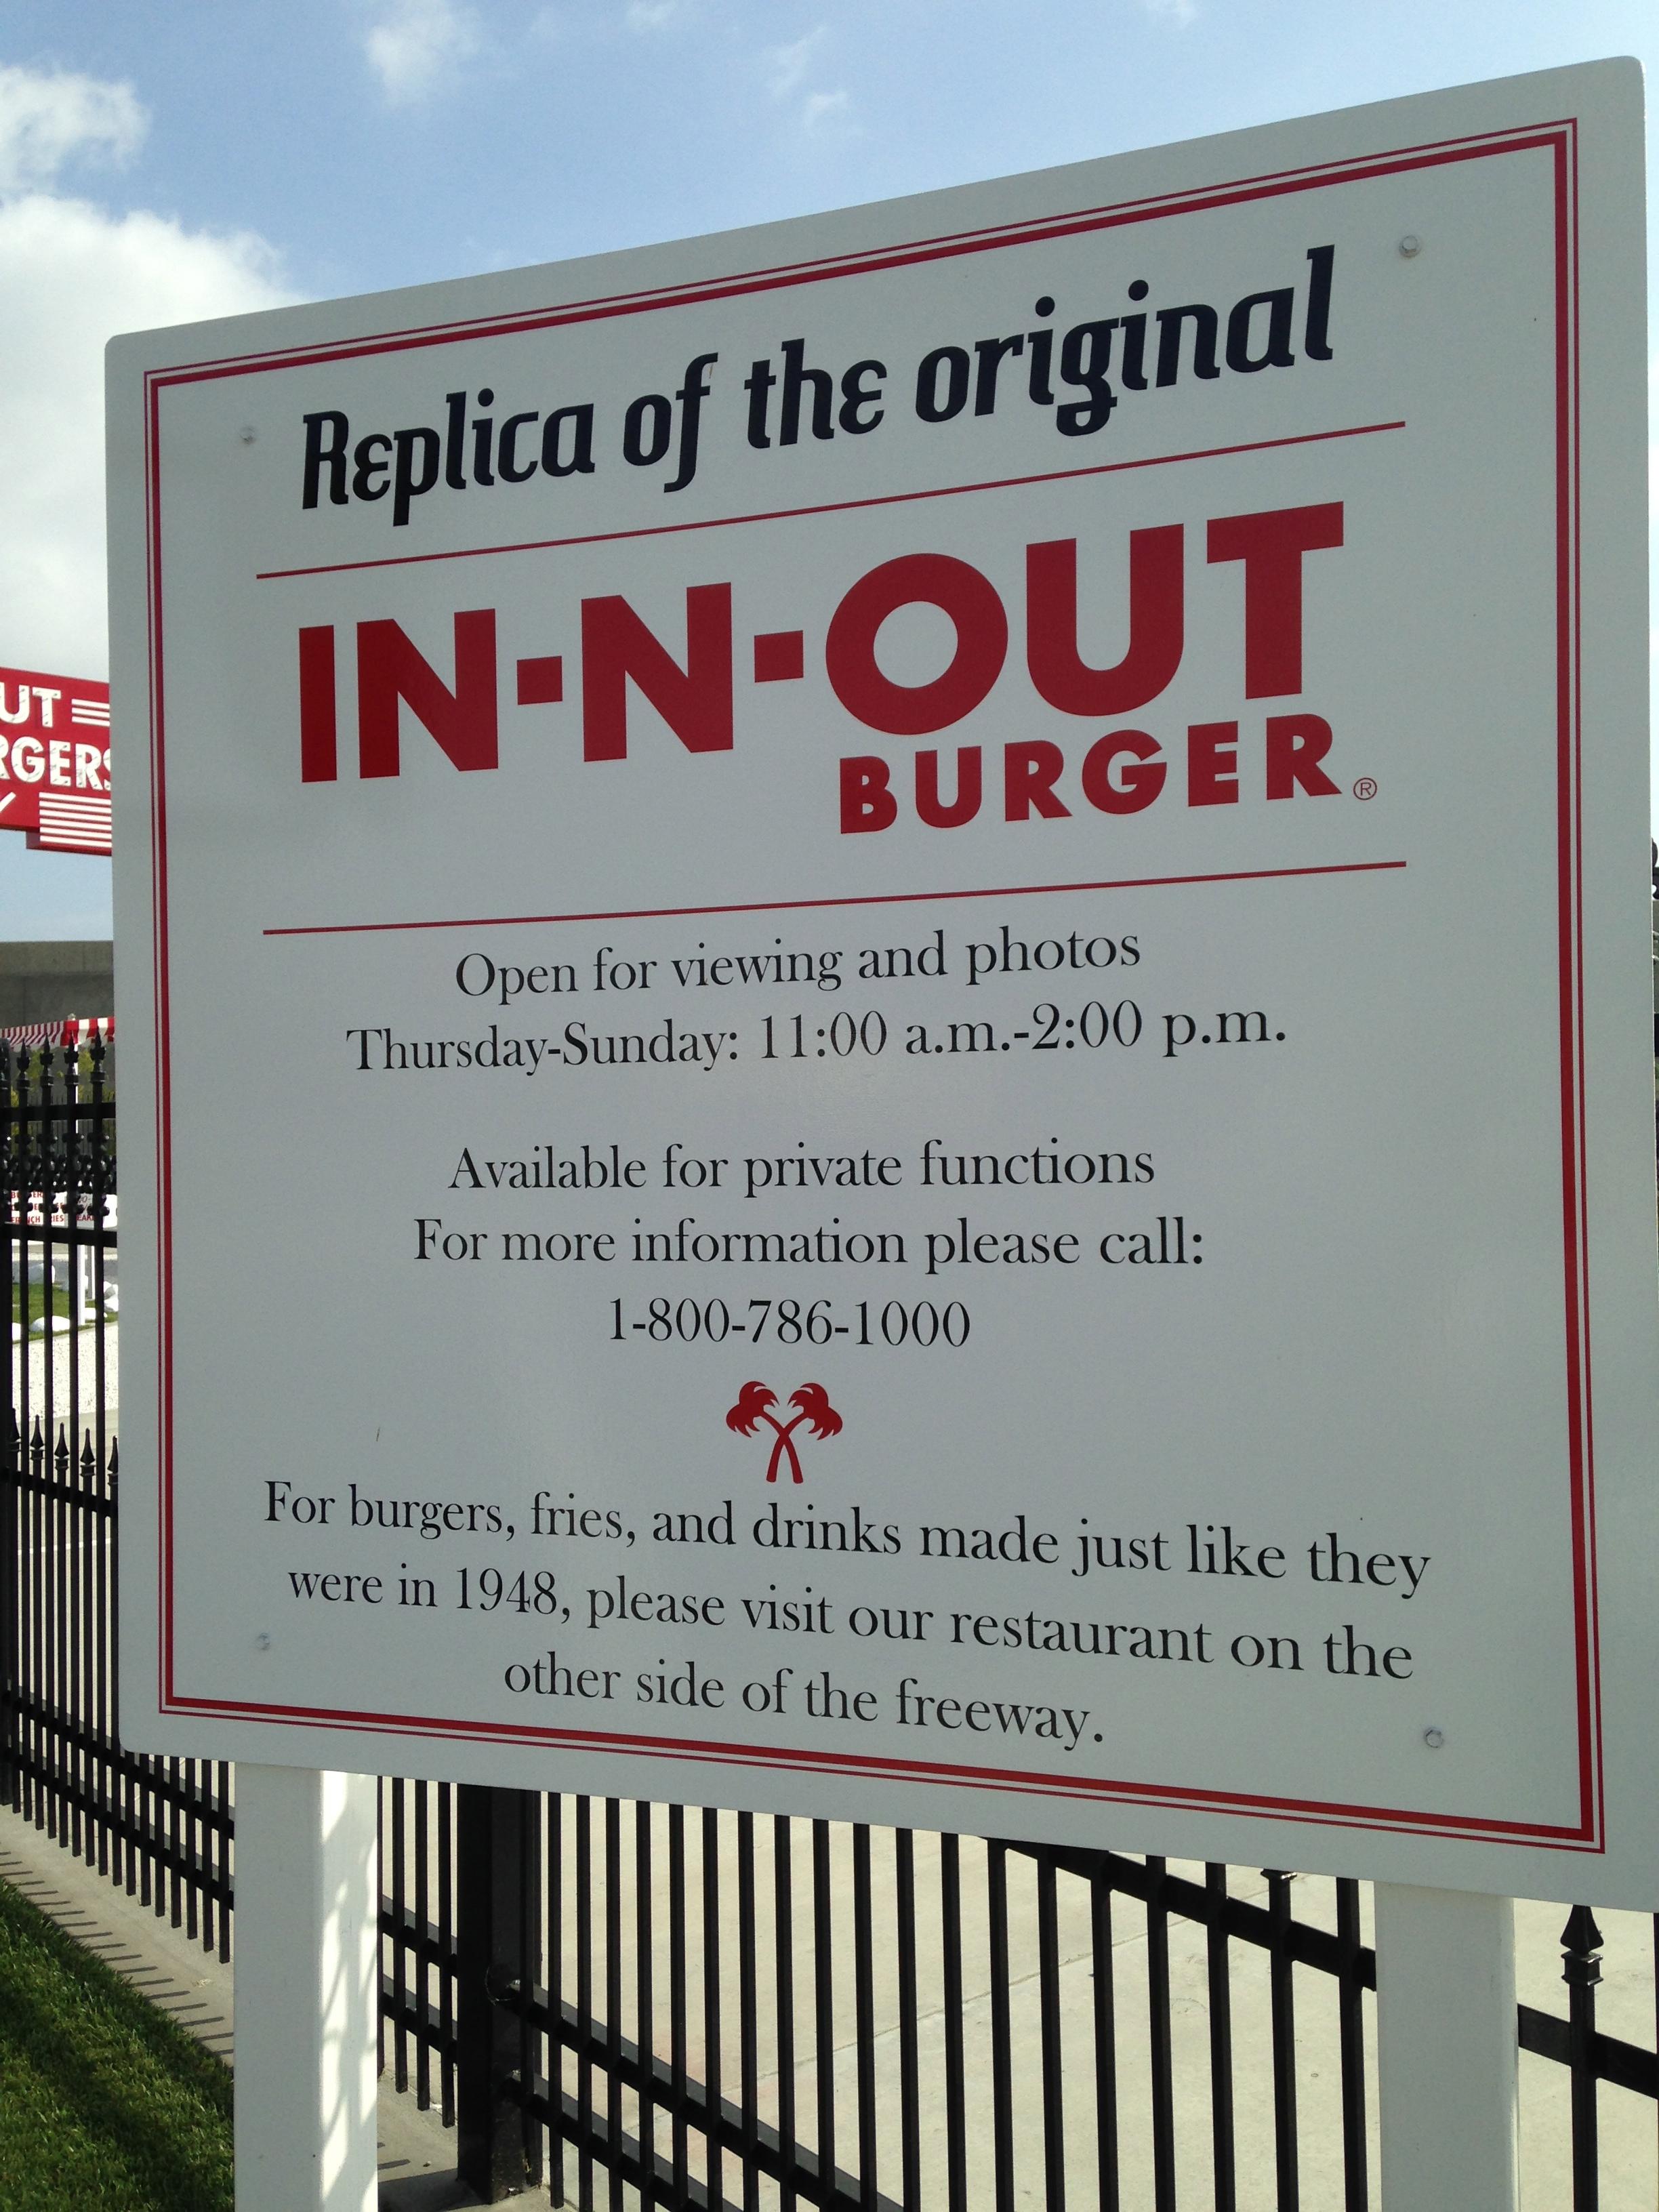 fae5022b67d24 Original In-N-Out Burger | California Curiosities